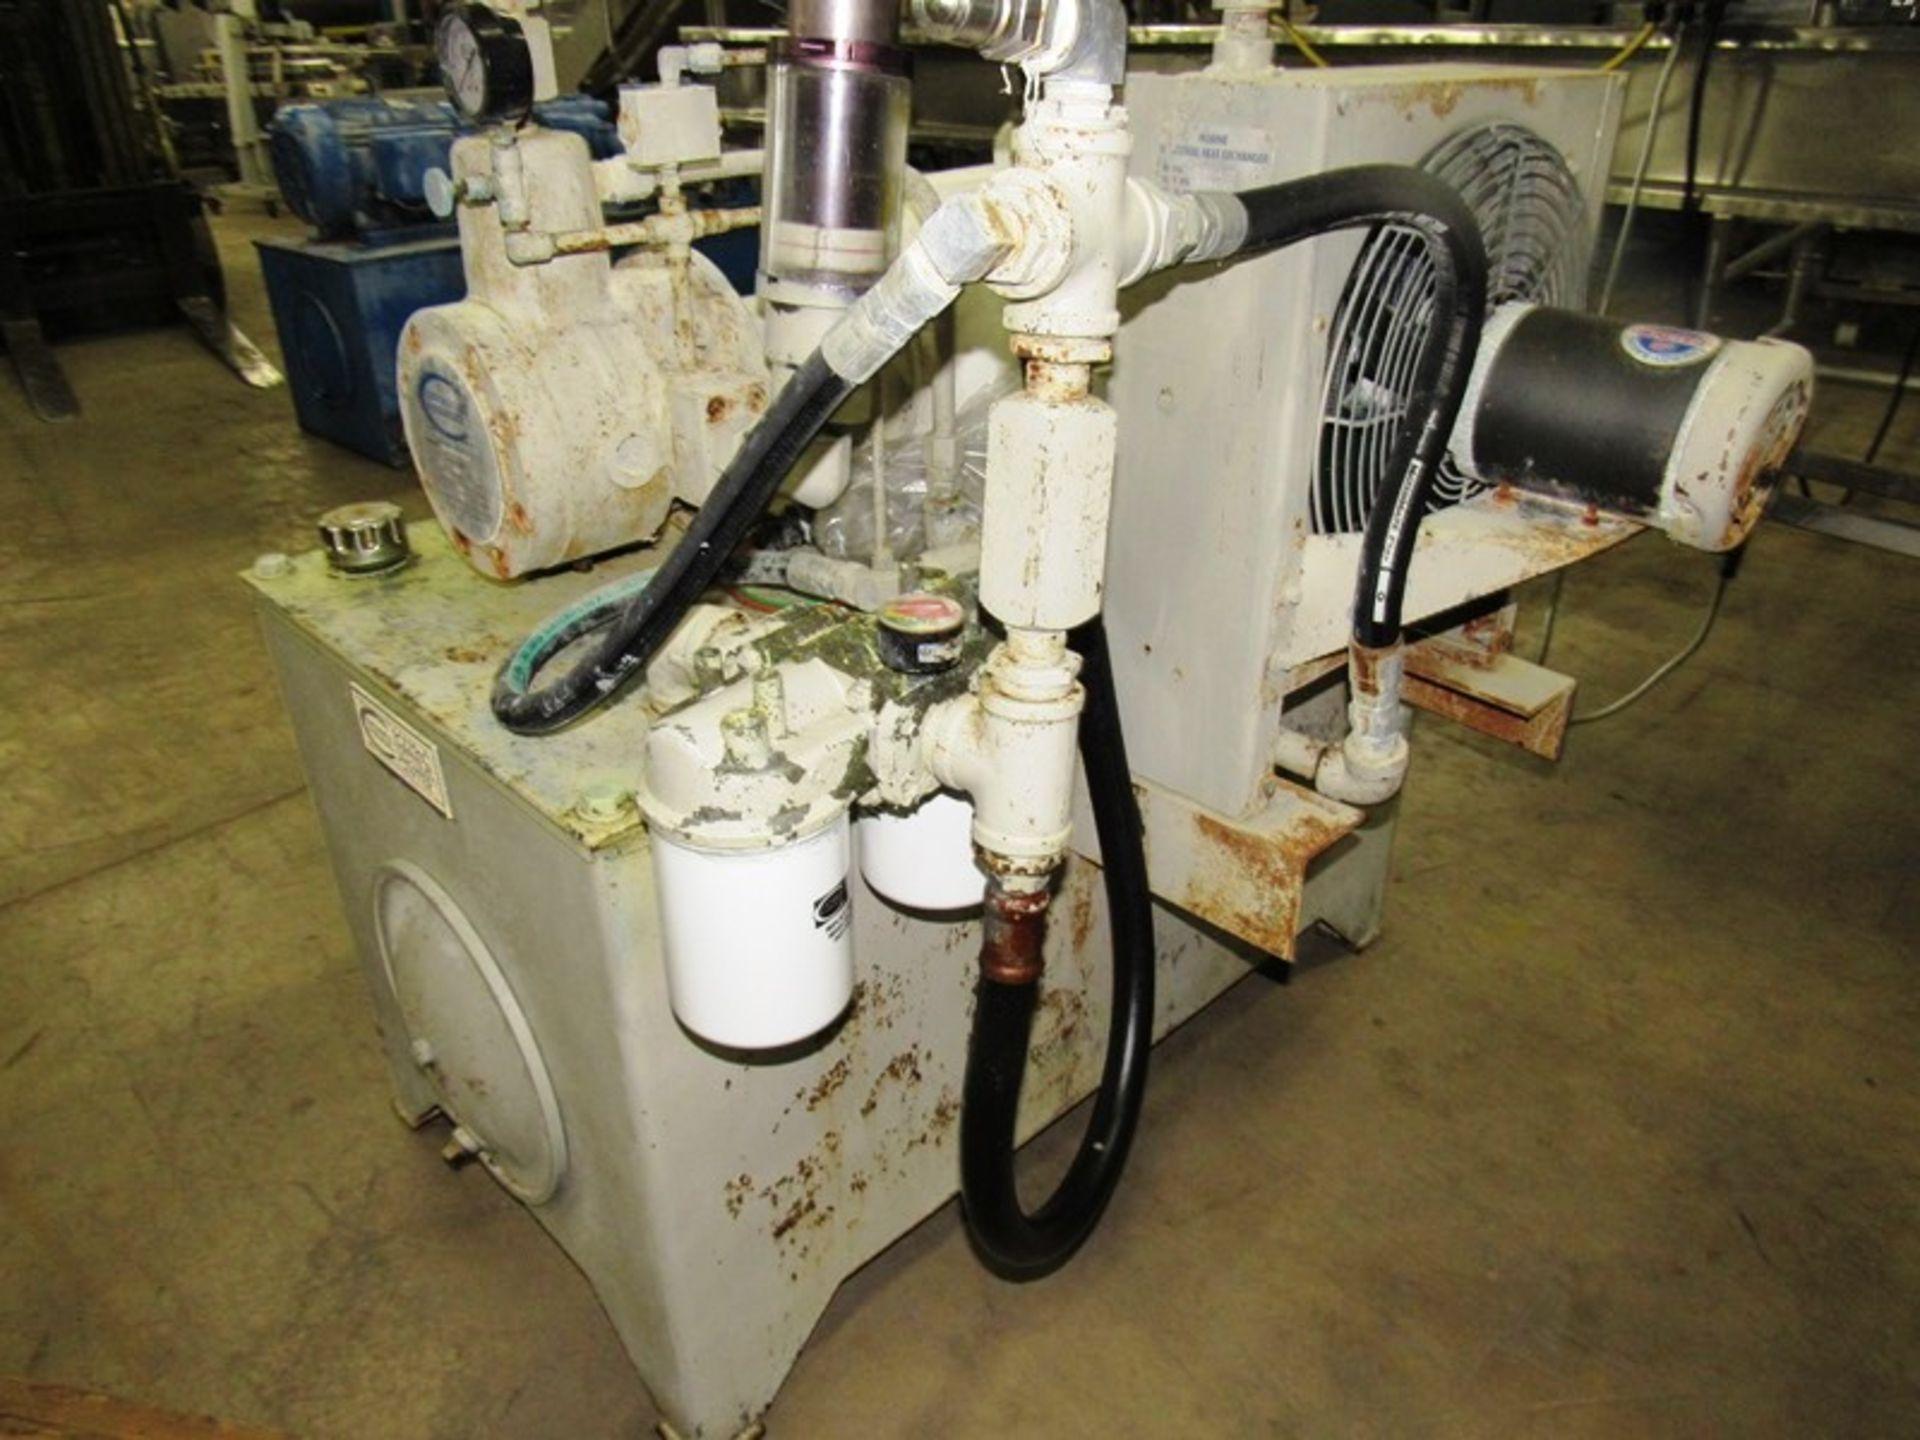 "Lot 16 - Stein Hydraulic Power Pack, 26"" W X 46"" L X 21"" D reservoir, 20 h.p., 230/460 volt motor on pump,"